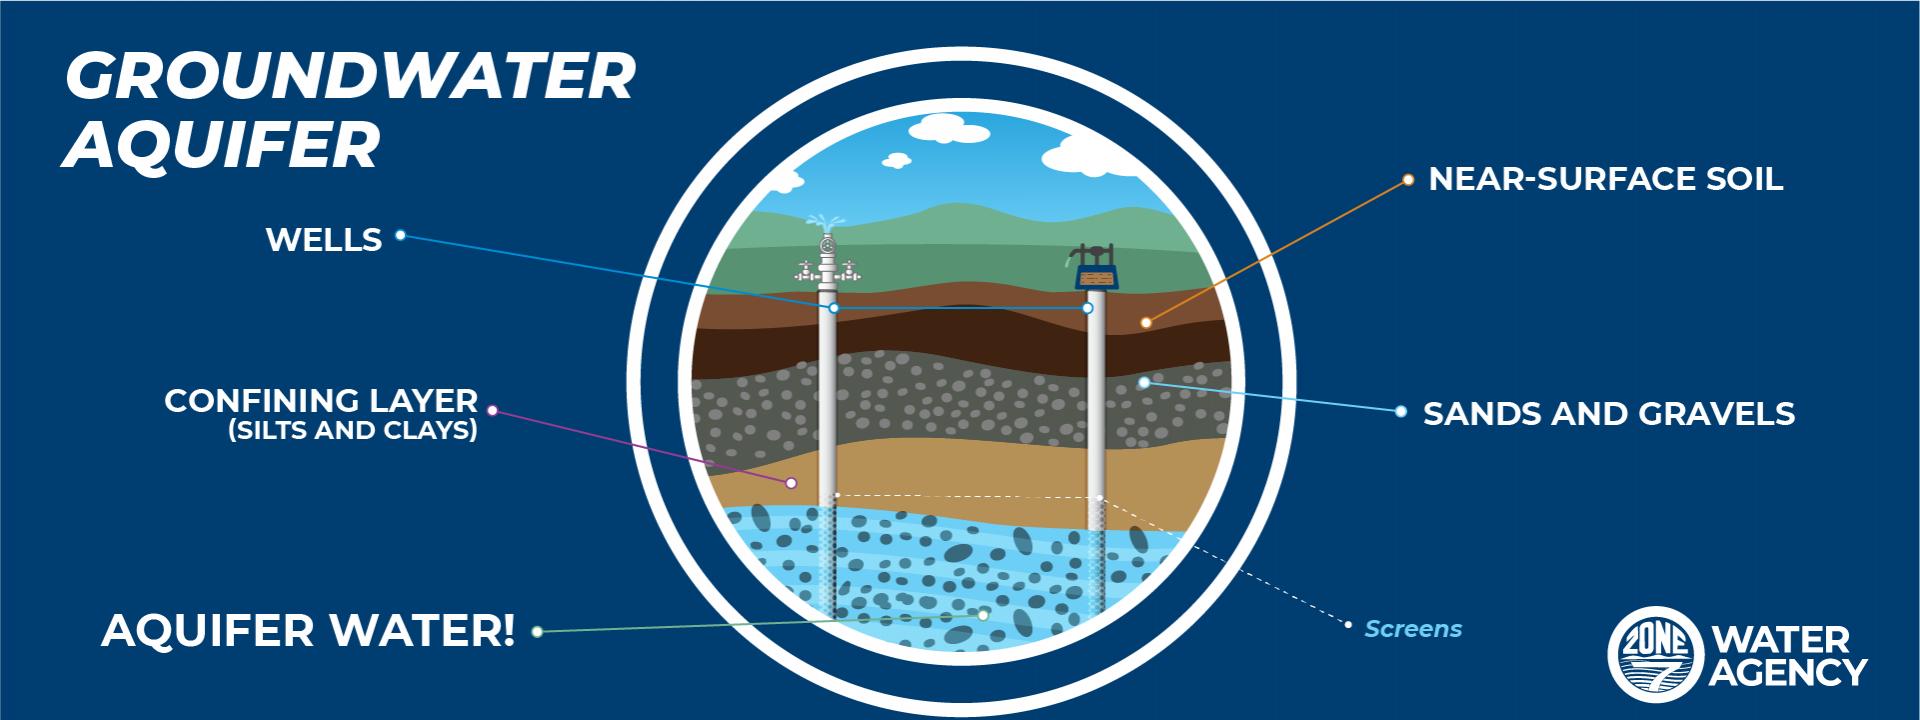 Groundwater Aquifer